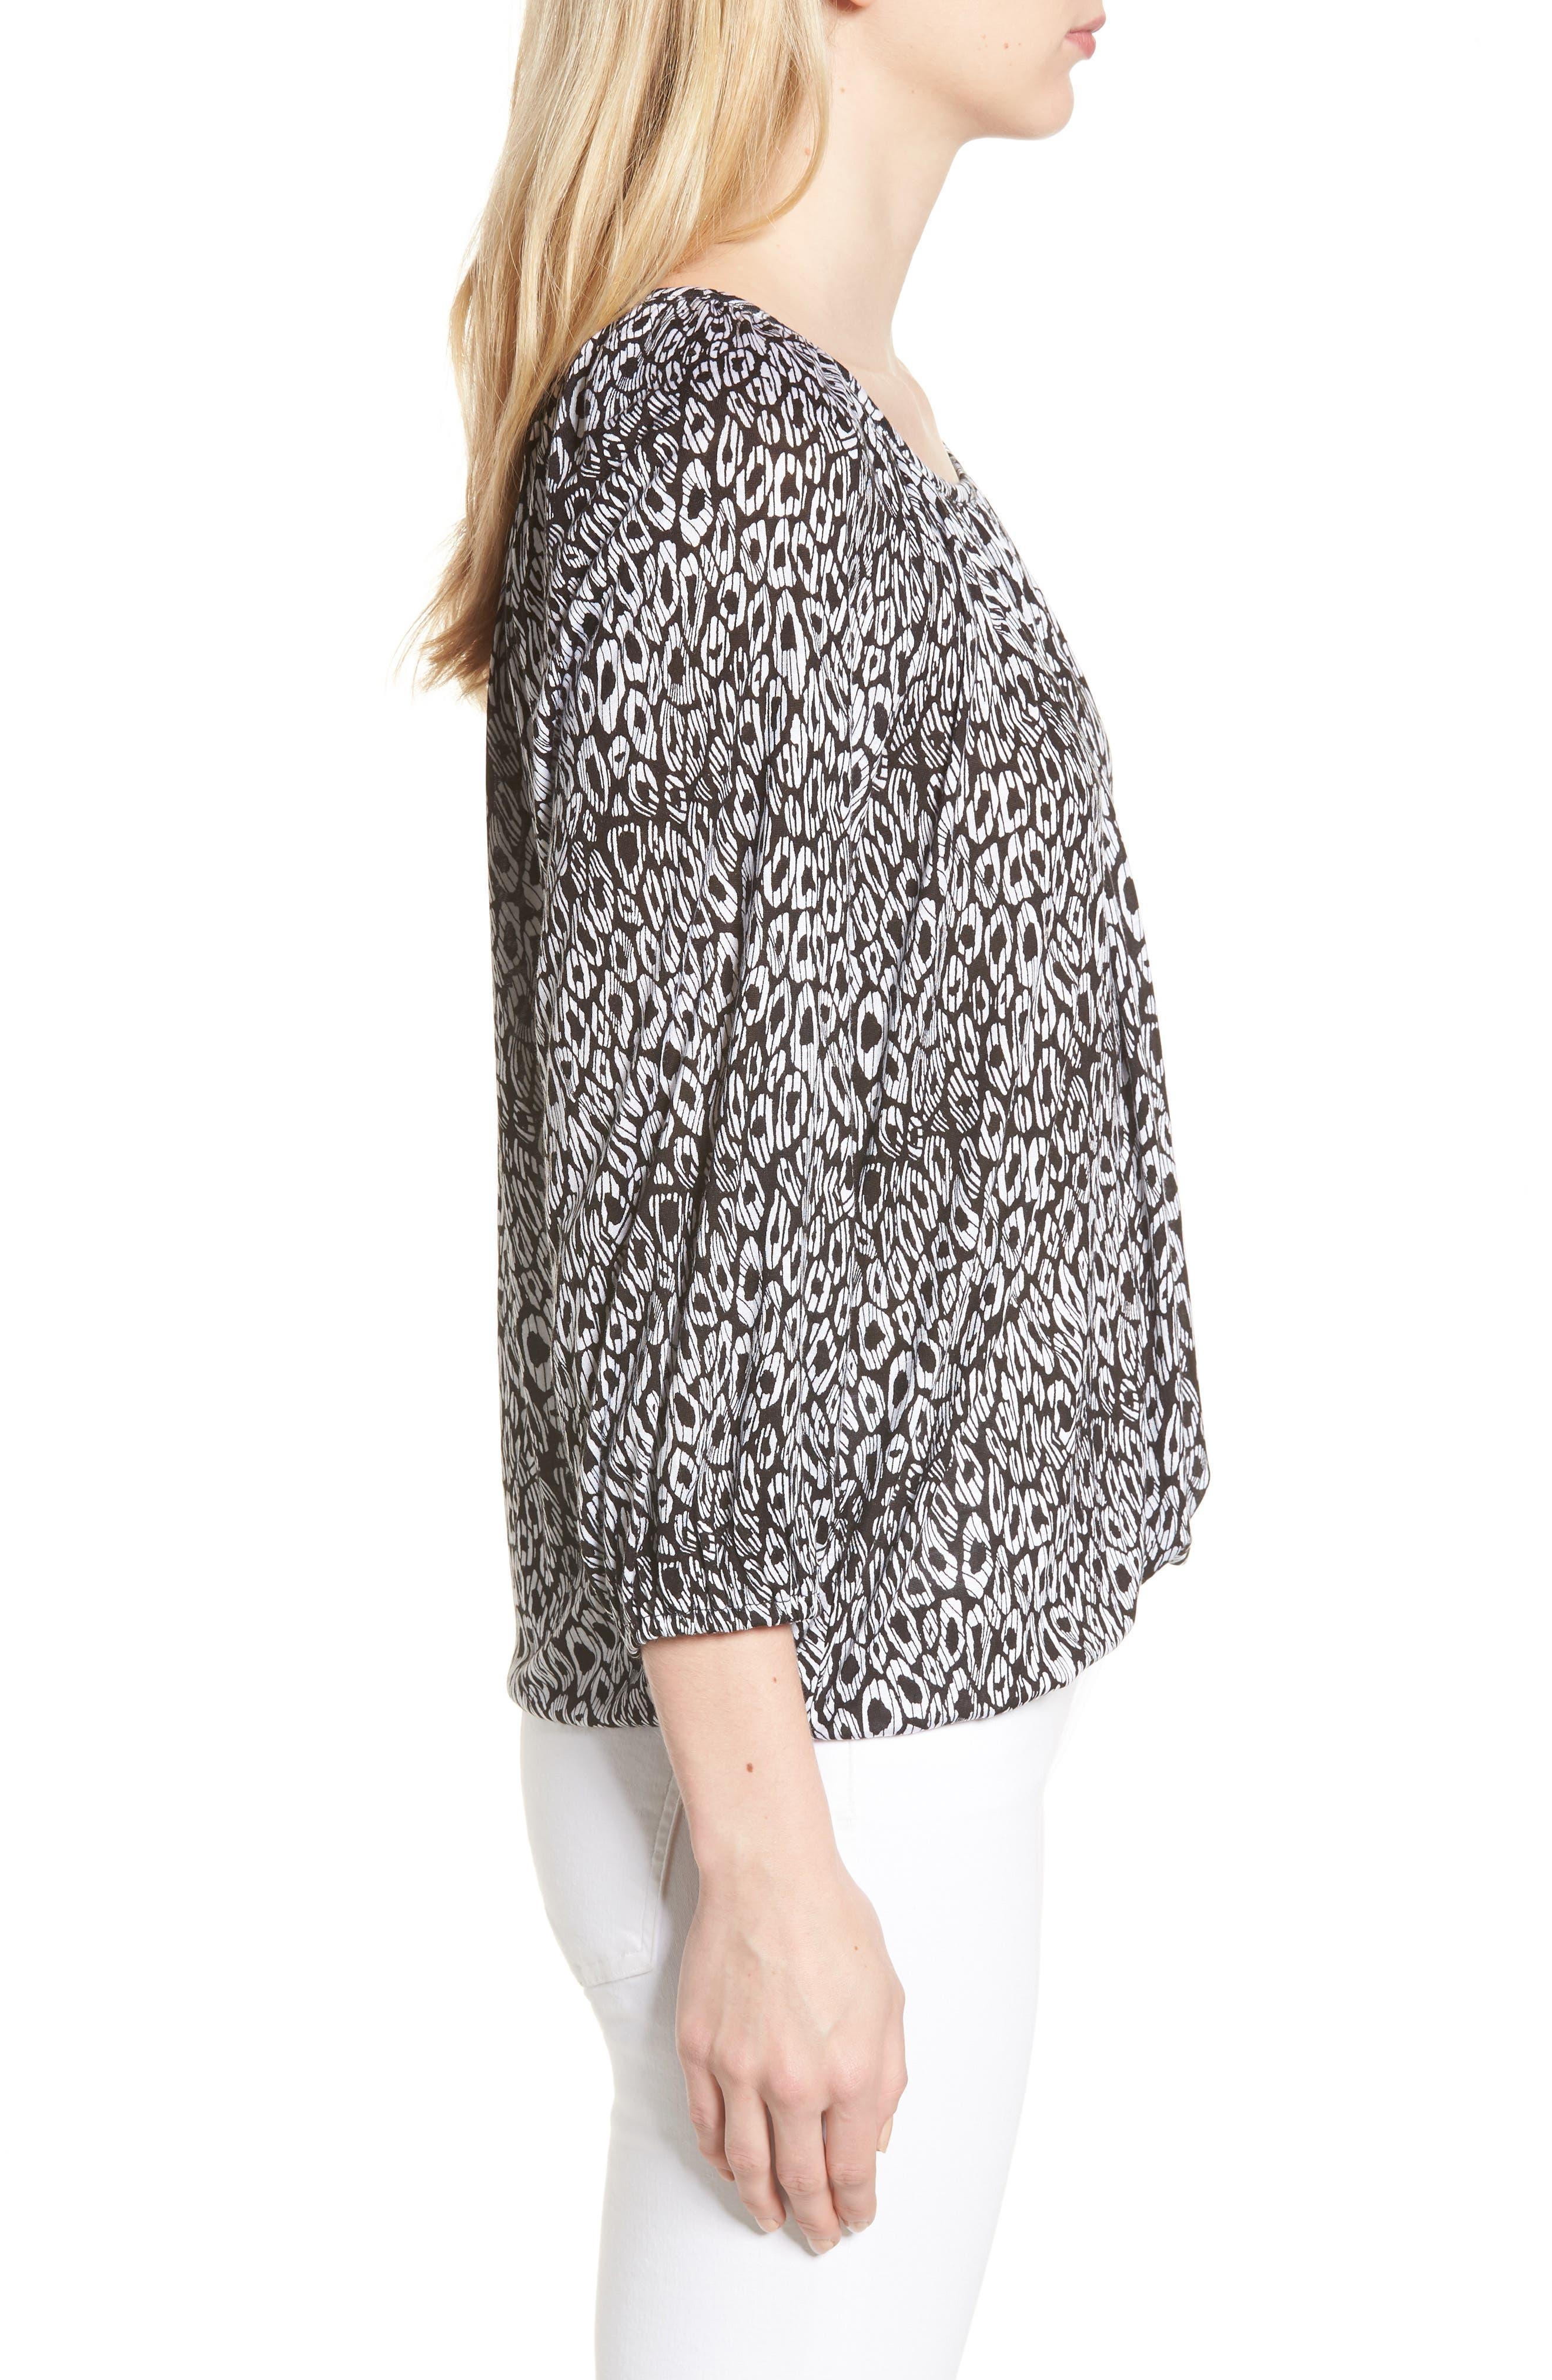 Wavy Leopard Stripe Peasant Top,                             Alternate thumbnail 3, color,                             Black/ White